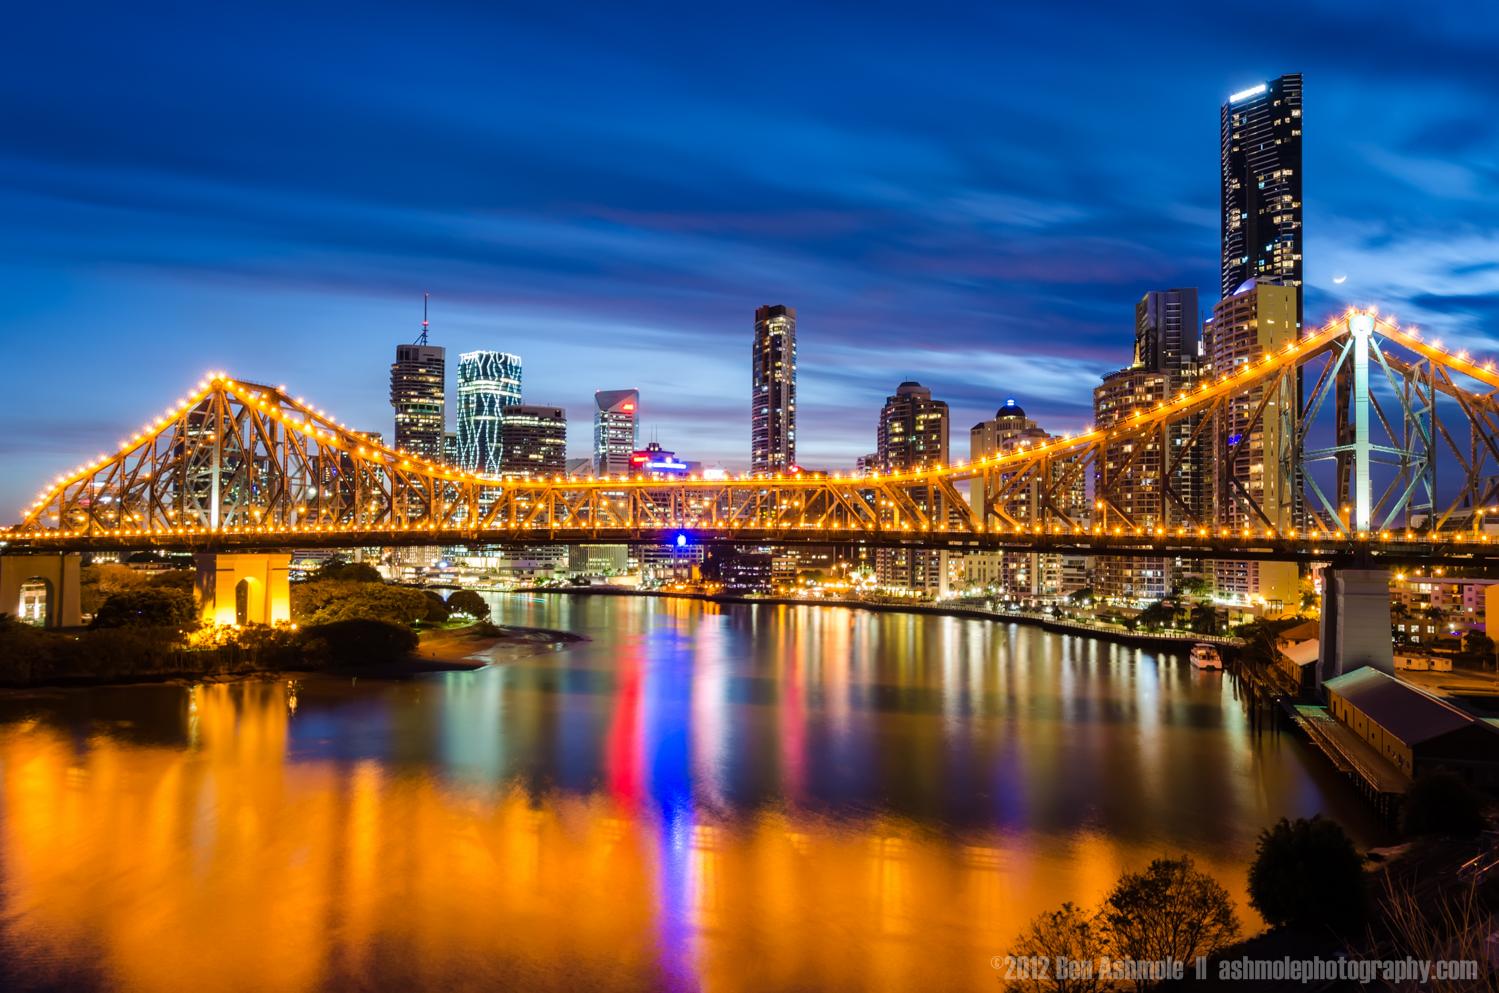 Brisbane and the Story Bridge in Blue Hour, Australia, Ben Ashmo